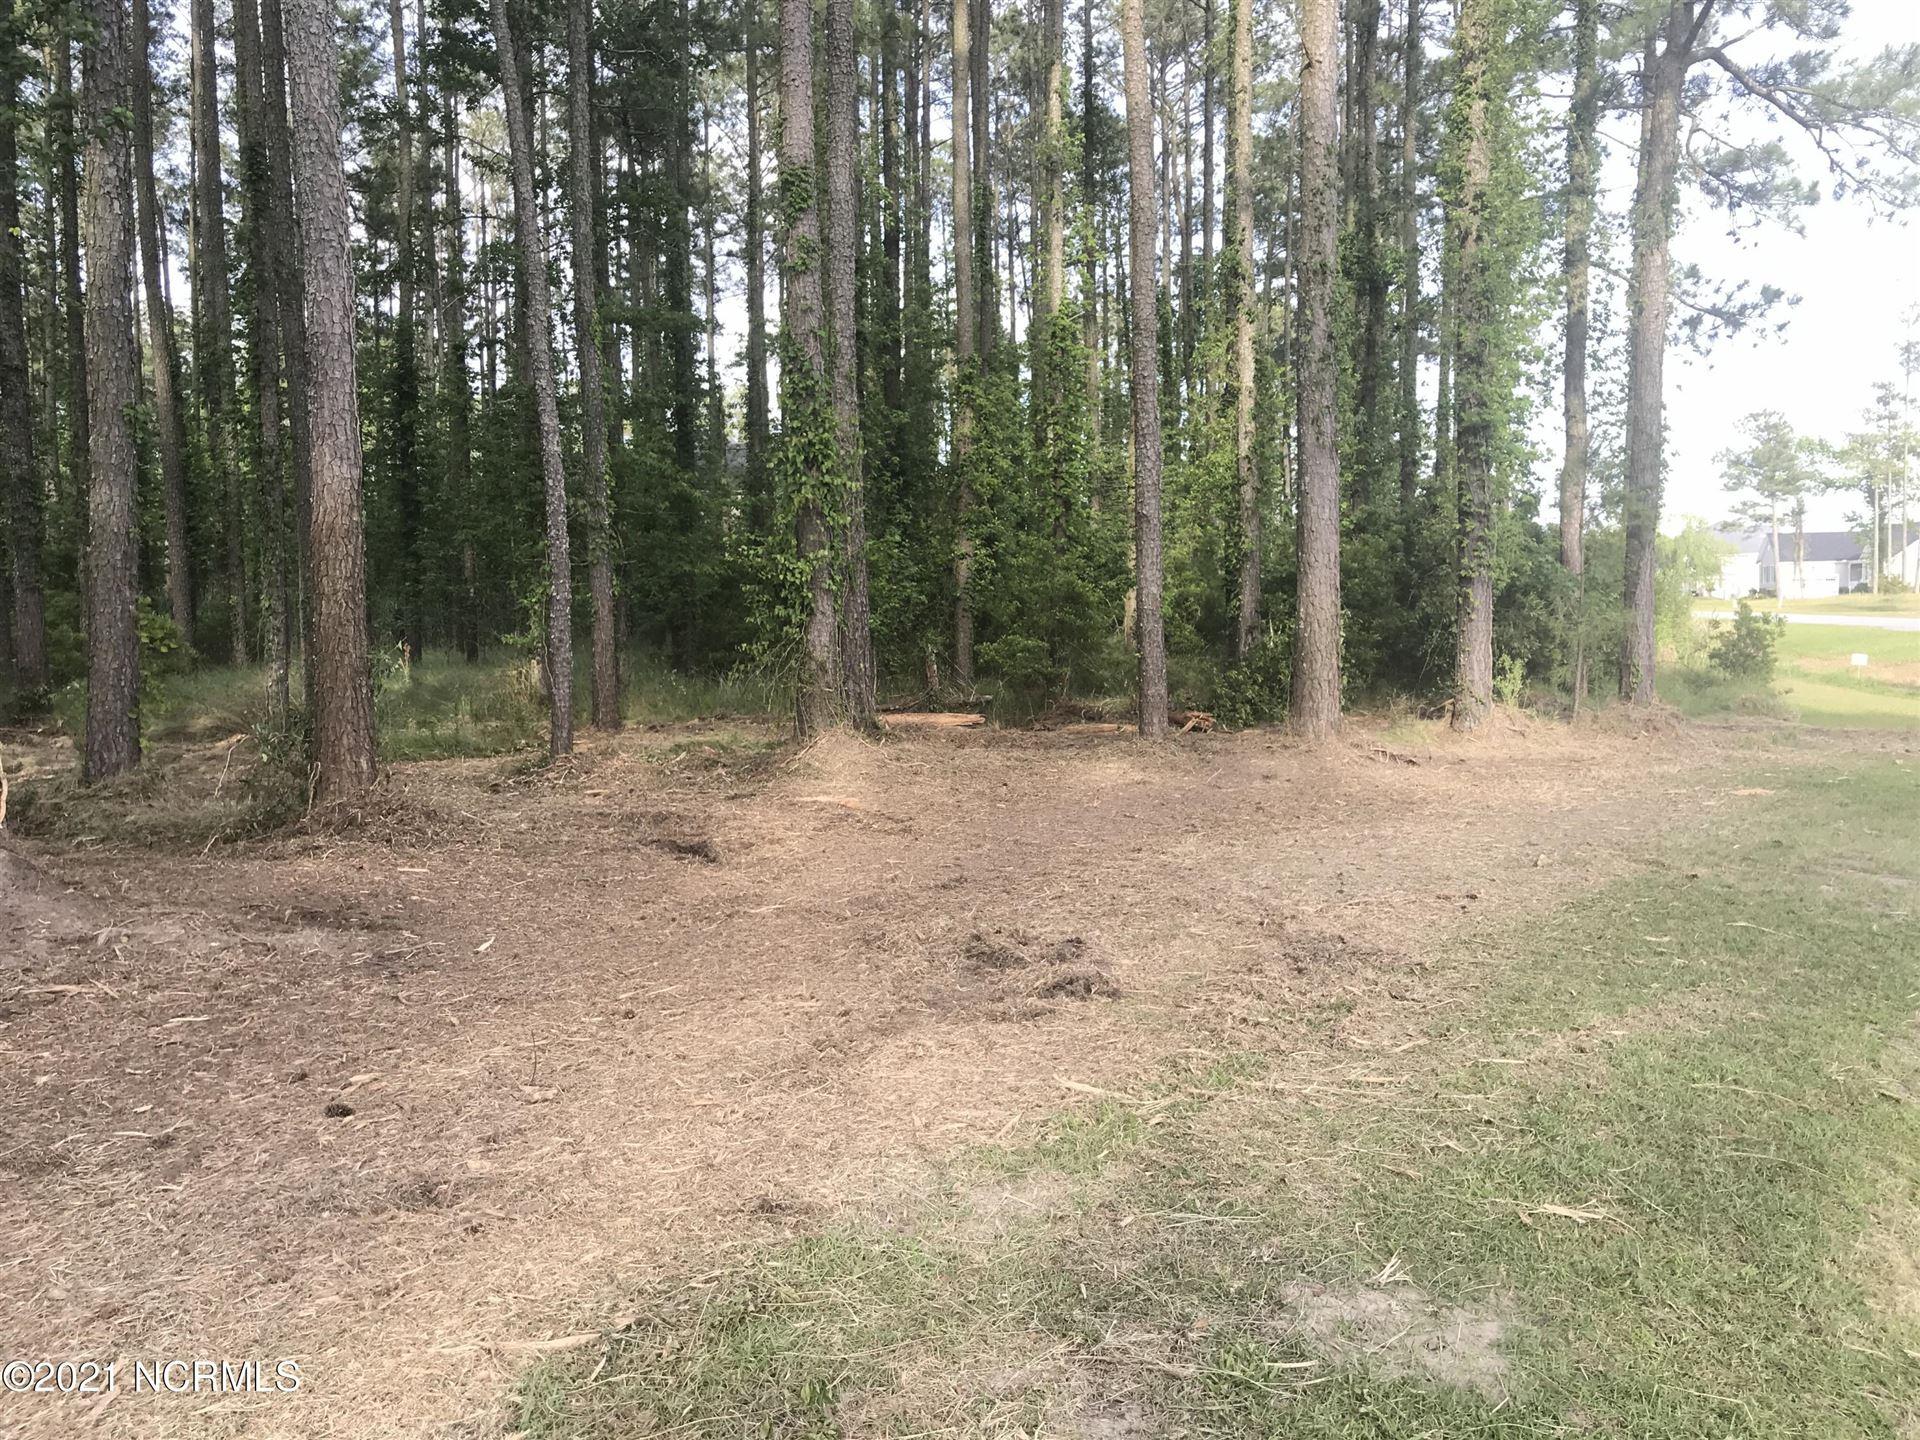 Photo of Lot 59 Dowry Creek W, Belhaven, NC 27810 (MLS # 100218295)